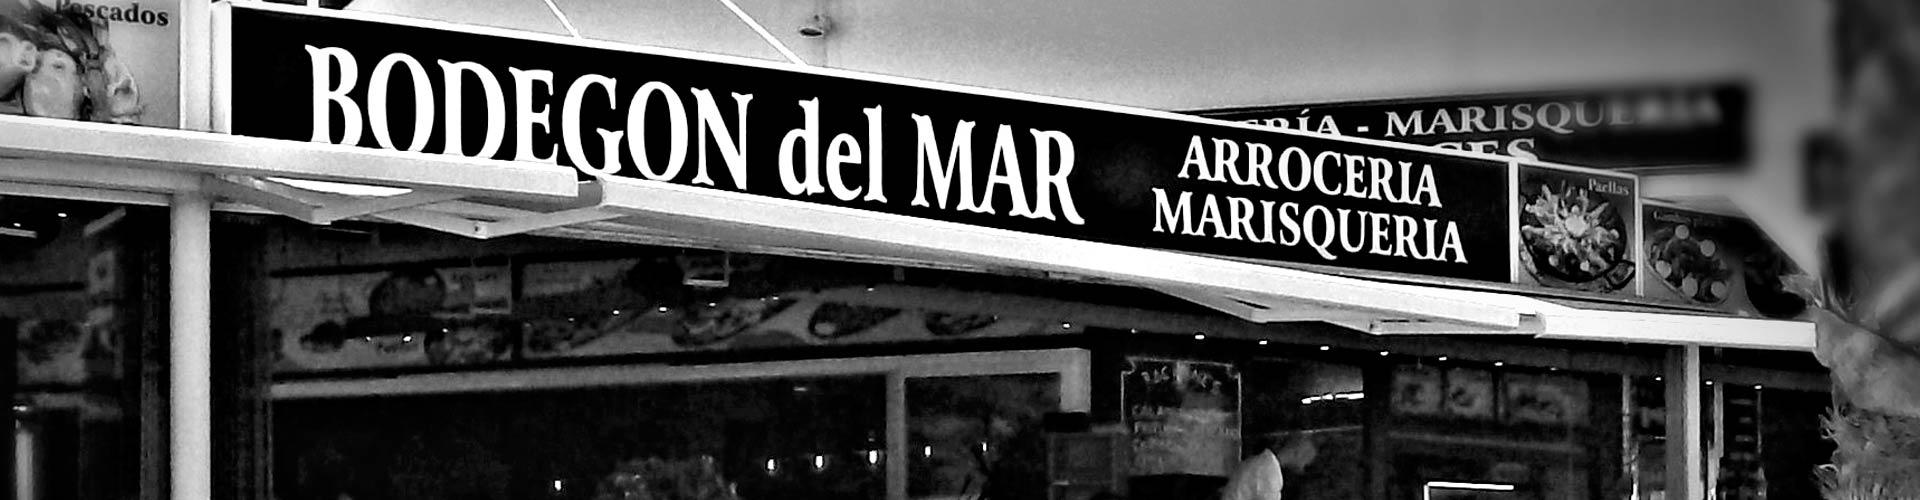 slider-el-bodego-del-mar